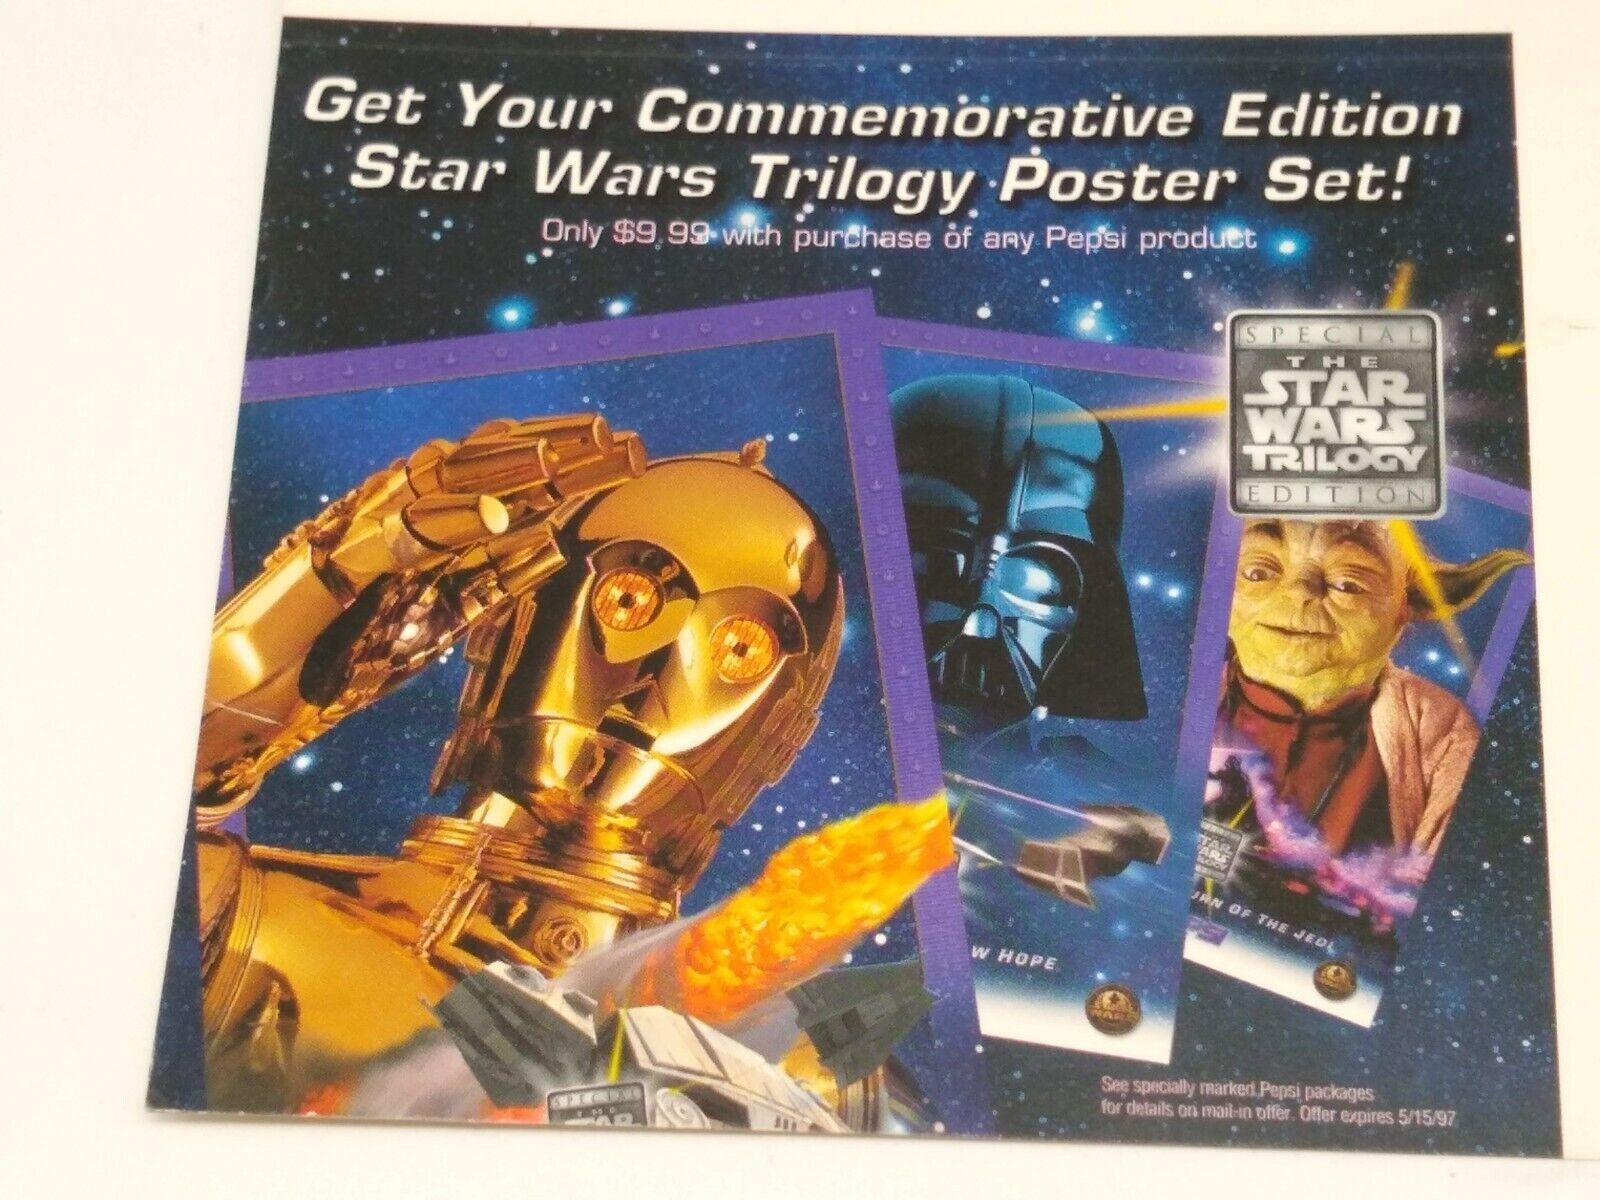 Star Wars 1997 Trilogy Poster Pepsi Store Display Shelf Talker - Unused